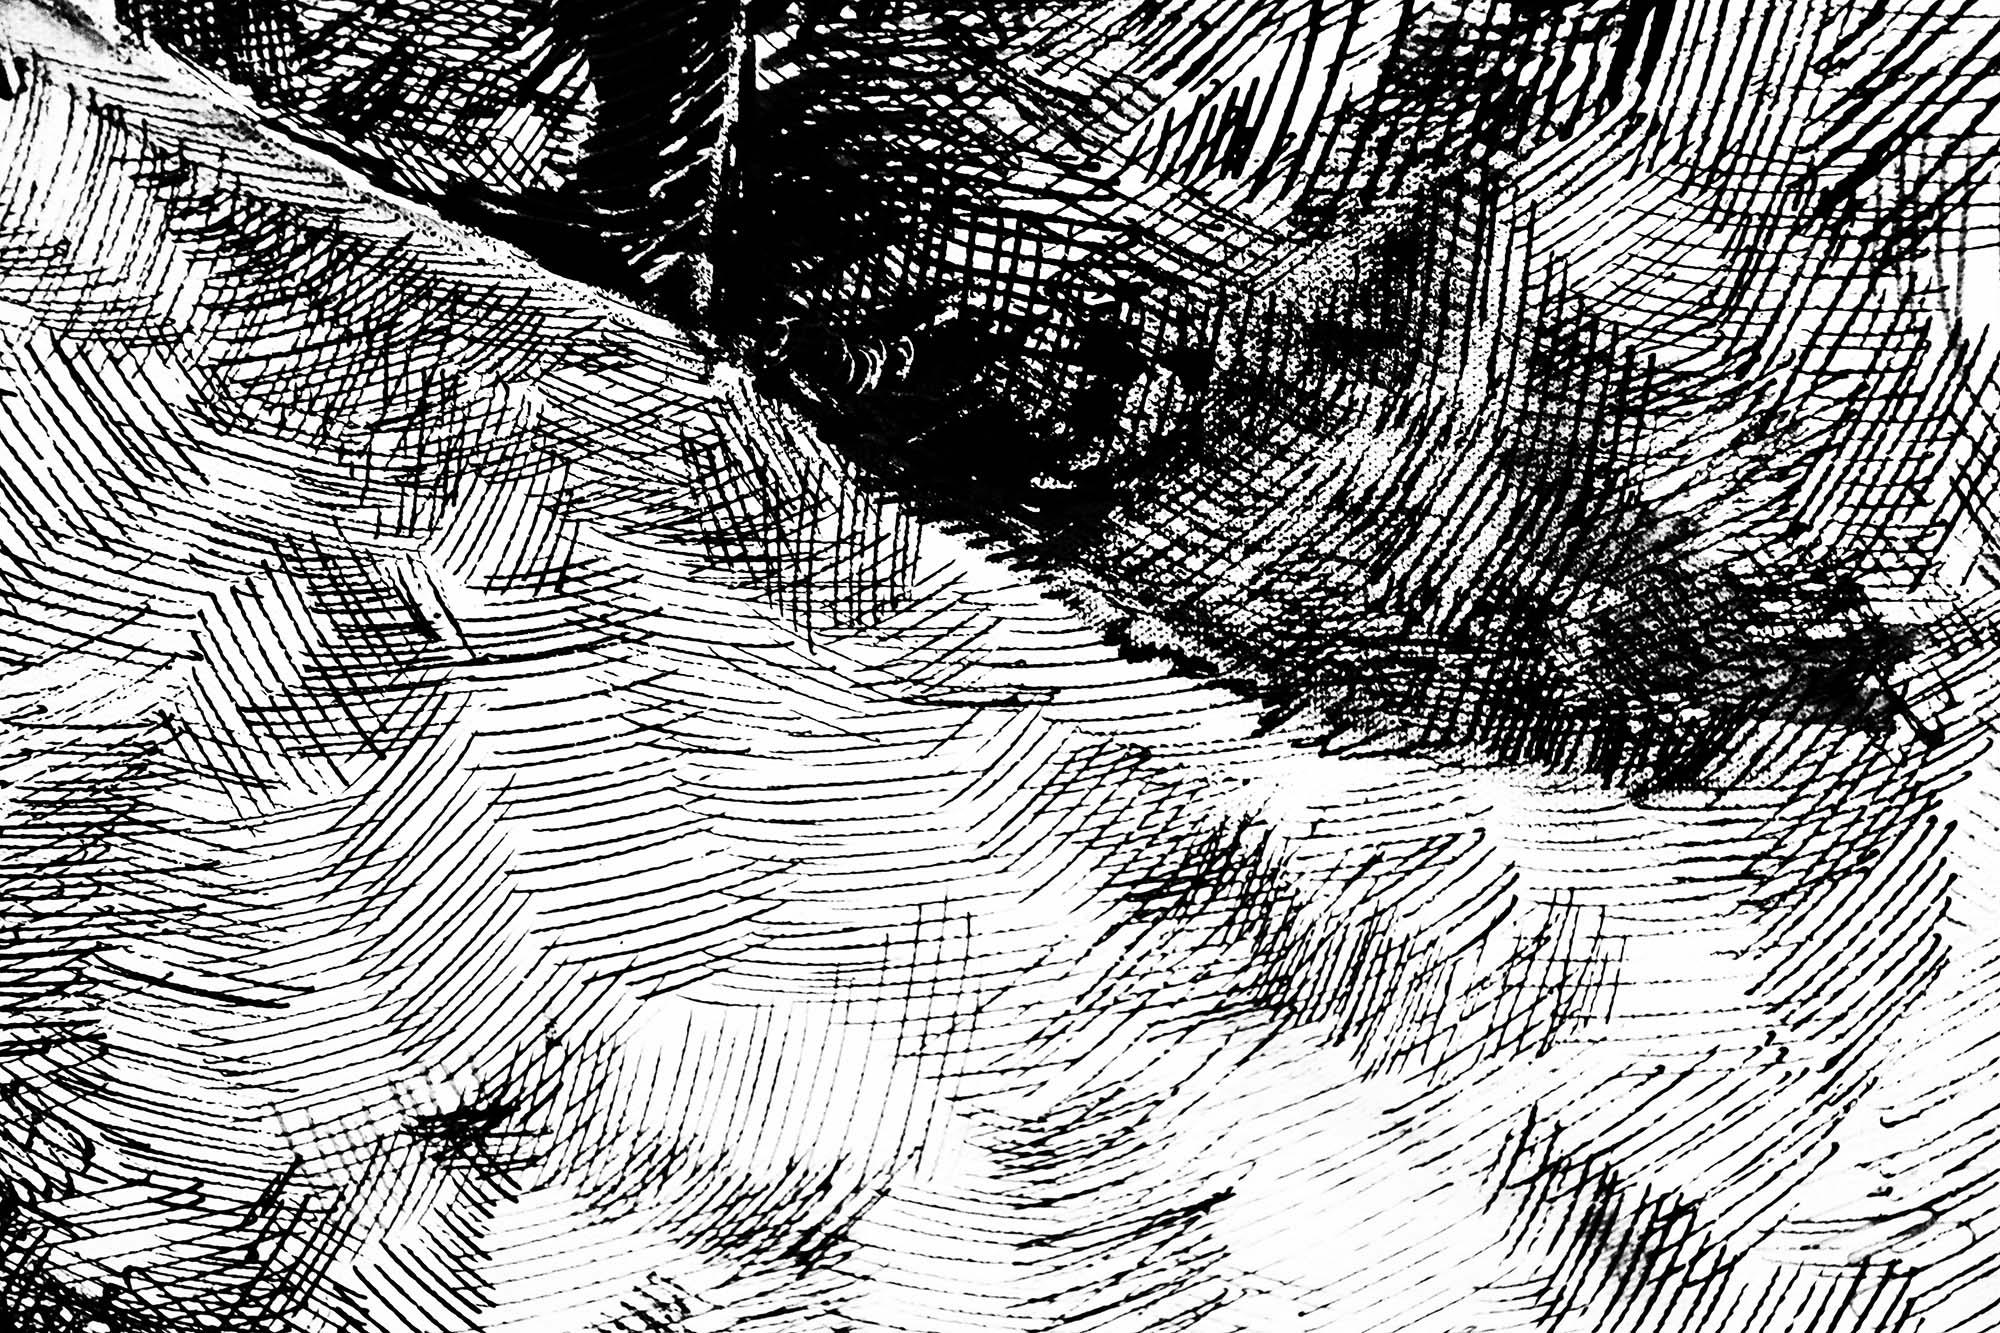 Abstract Vector Texture